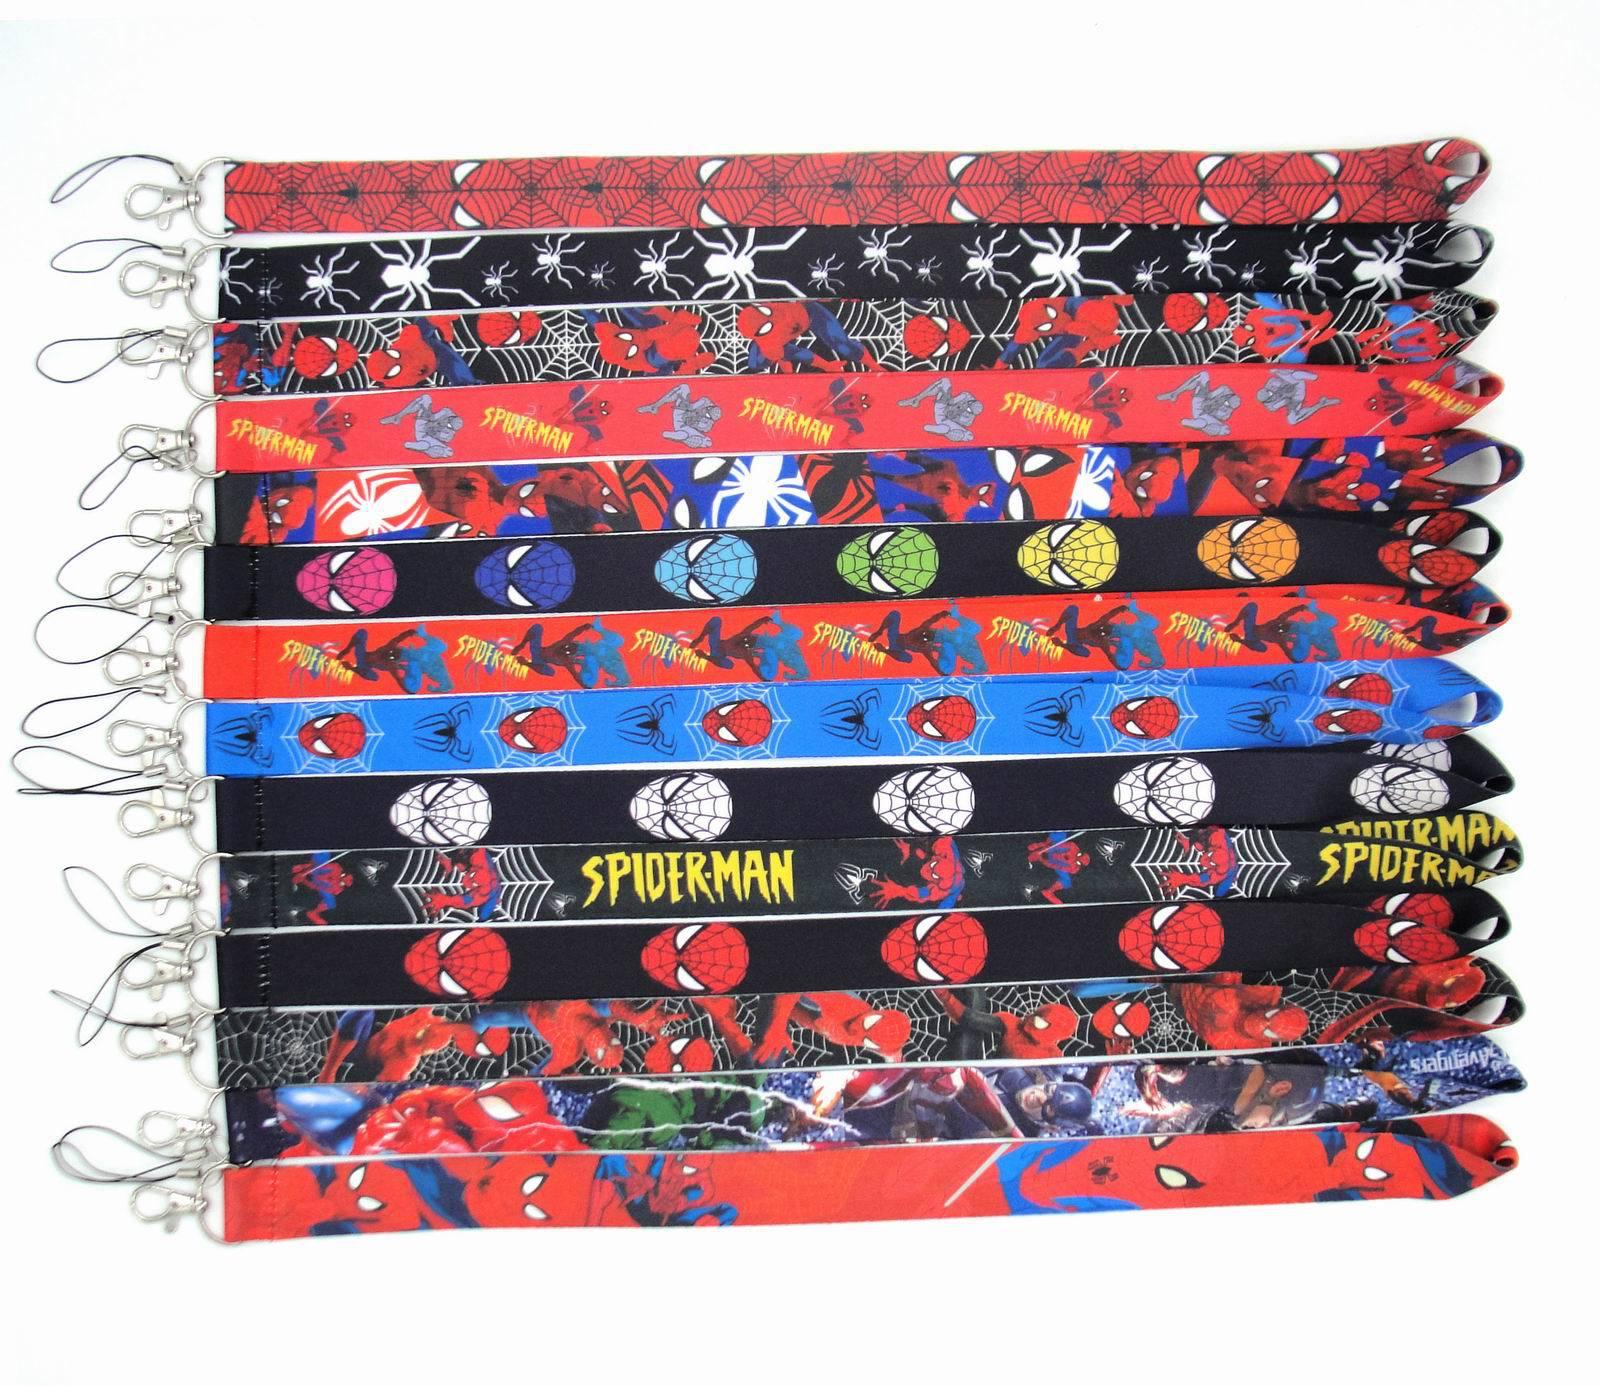 Hot Sale High Quality Cute Cartoon Spider Man Lanyards Fashion Marvel Design Lanyard Wholesale Promotional Gift Lanyards Custom